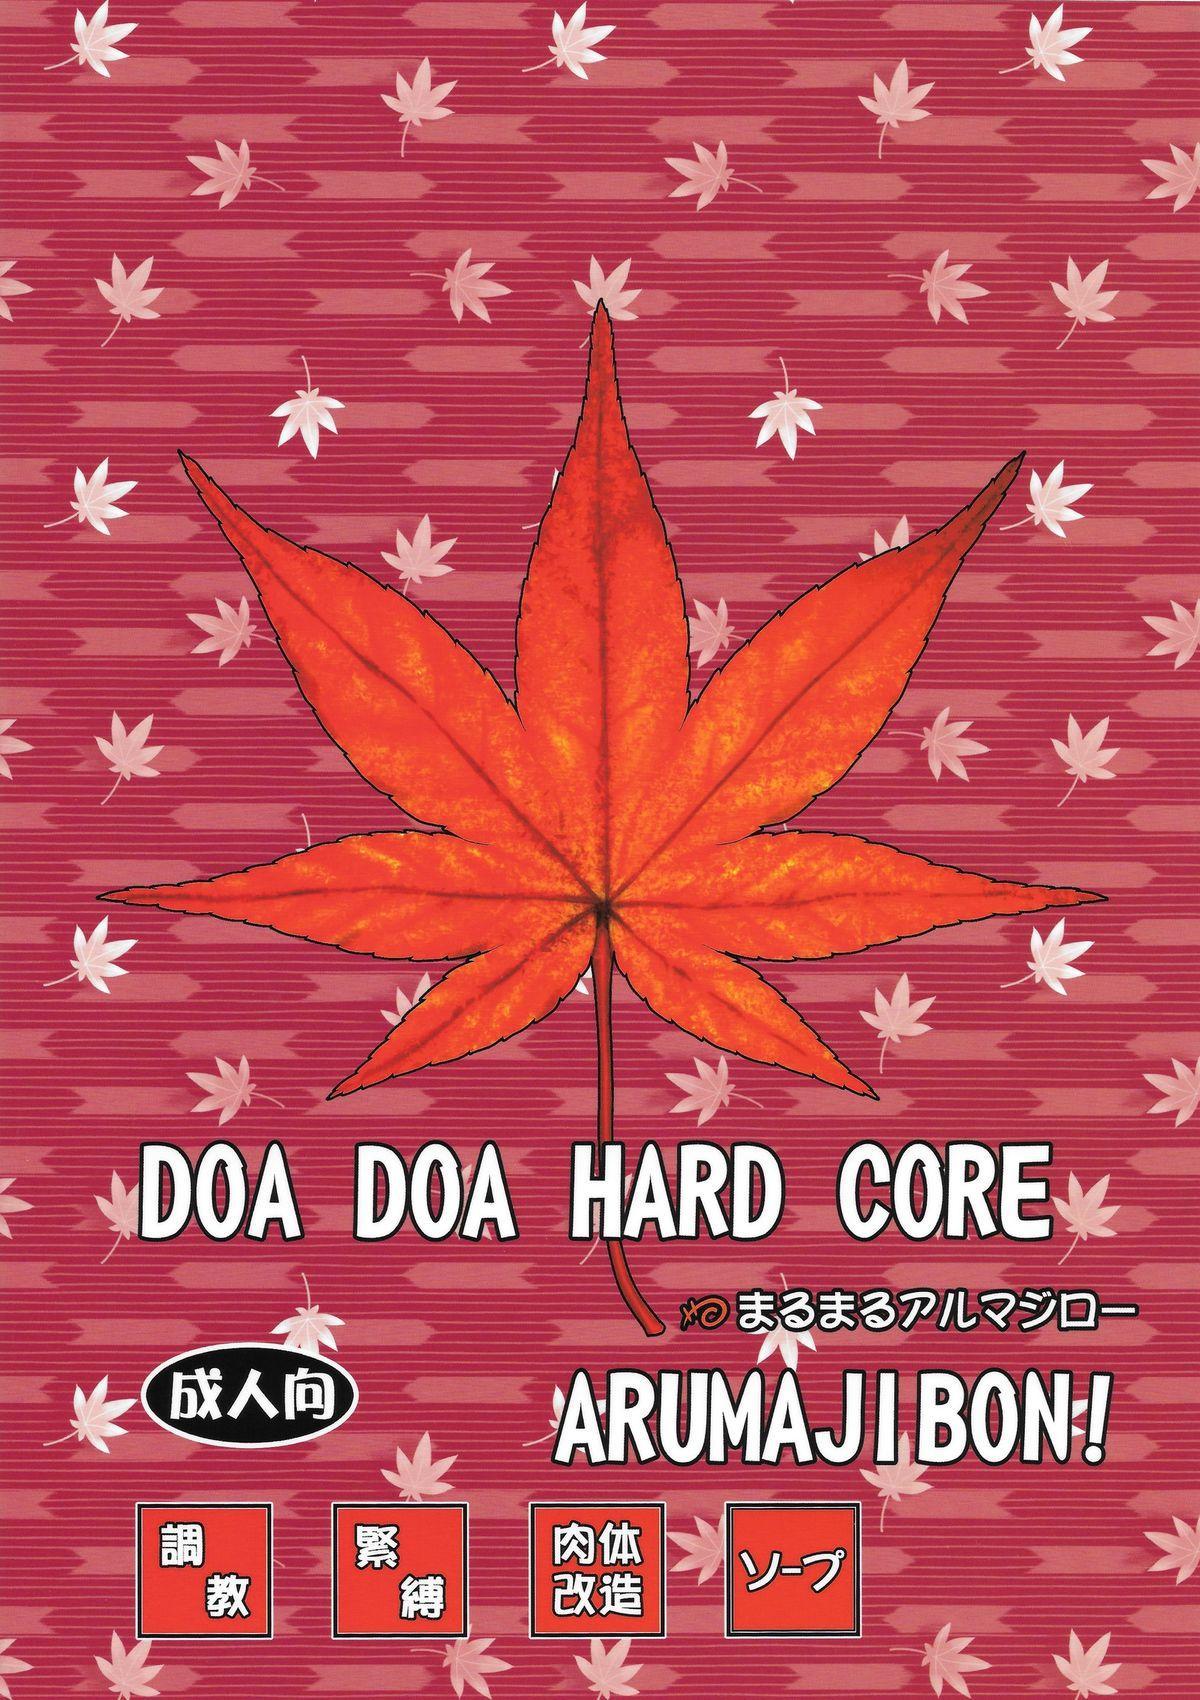 DOA DOA HARD CORE Momijizome   DOA DOA HARD CORE - Staining Momiji 49